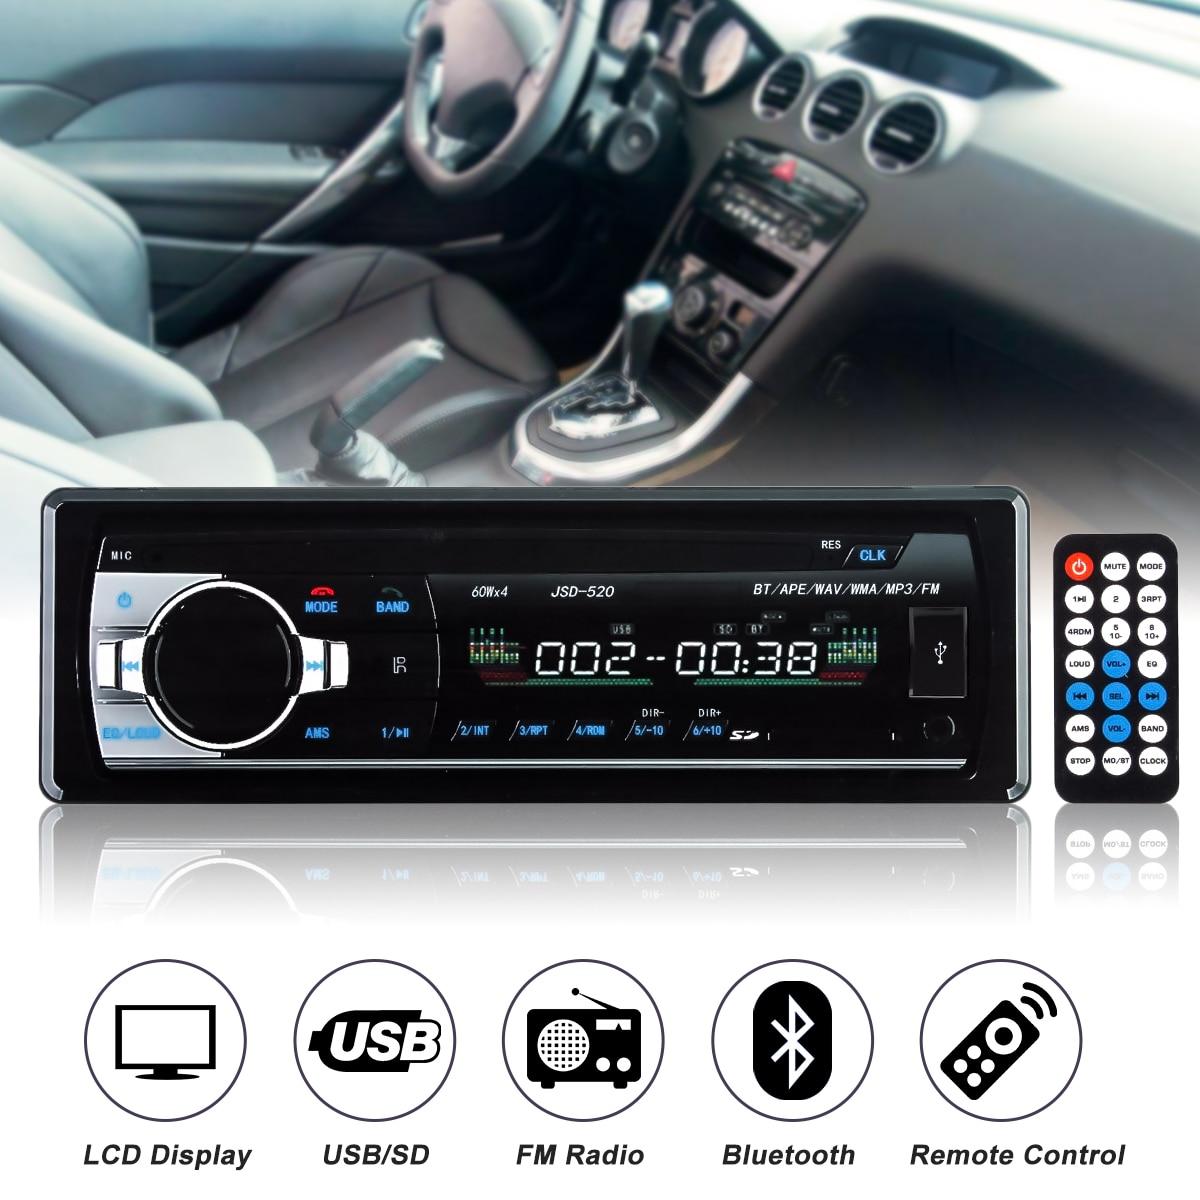 цена на Auto Car 1 DIN Bluetooth In Dash Stereo Headunit Radio Audio MP3 Player USB SD WMA In-dash AUX FM 12V